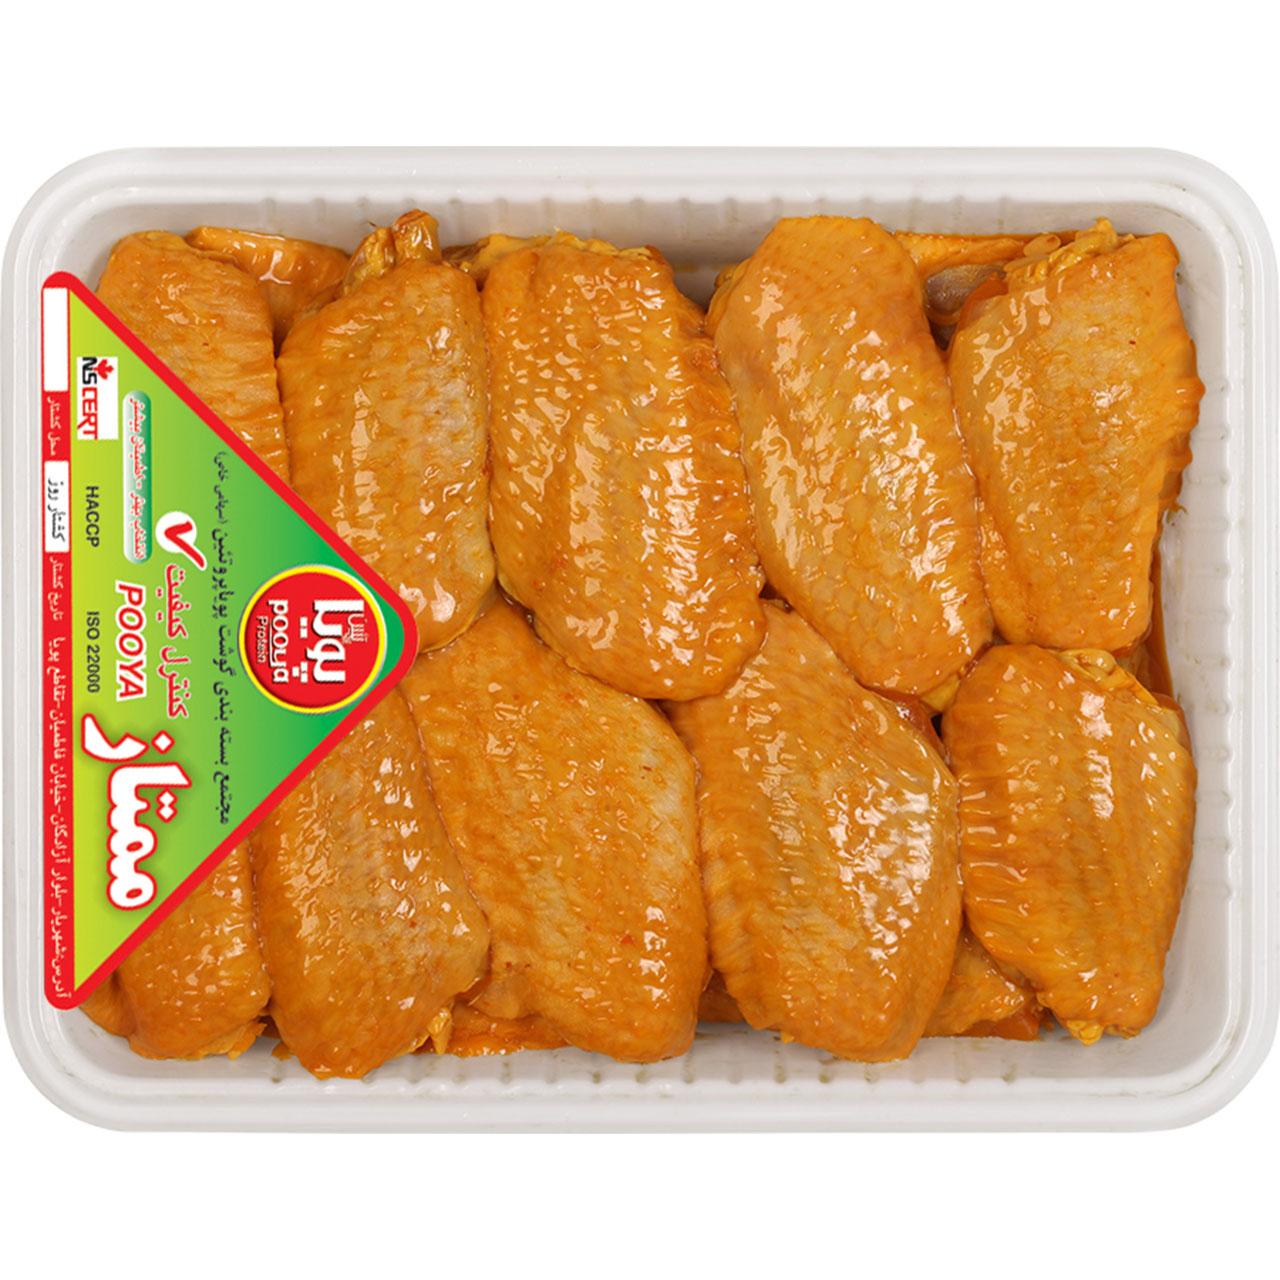 بال کبابی مرغ پویا پروتئین وزن 900 گرم